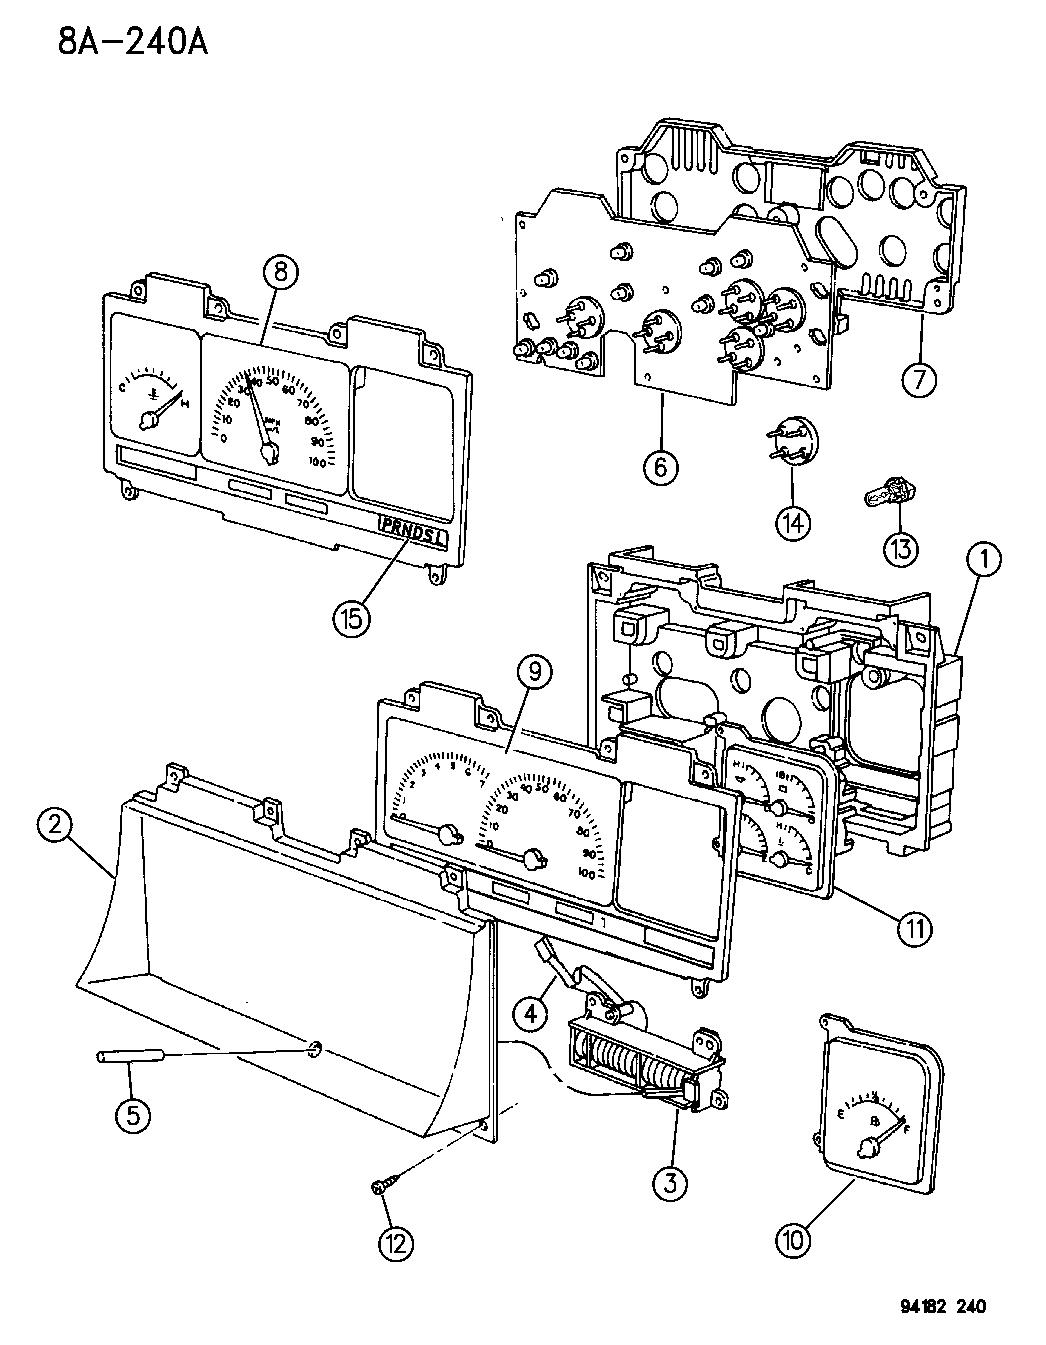 4688276 - Genuine Mopar INDICATOR GEAR SELECTOR